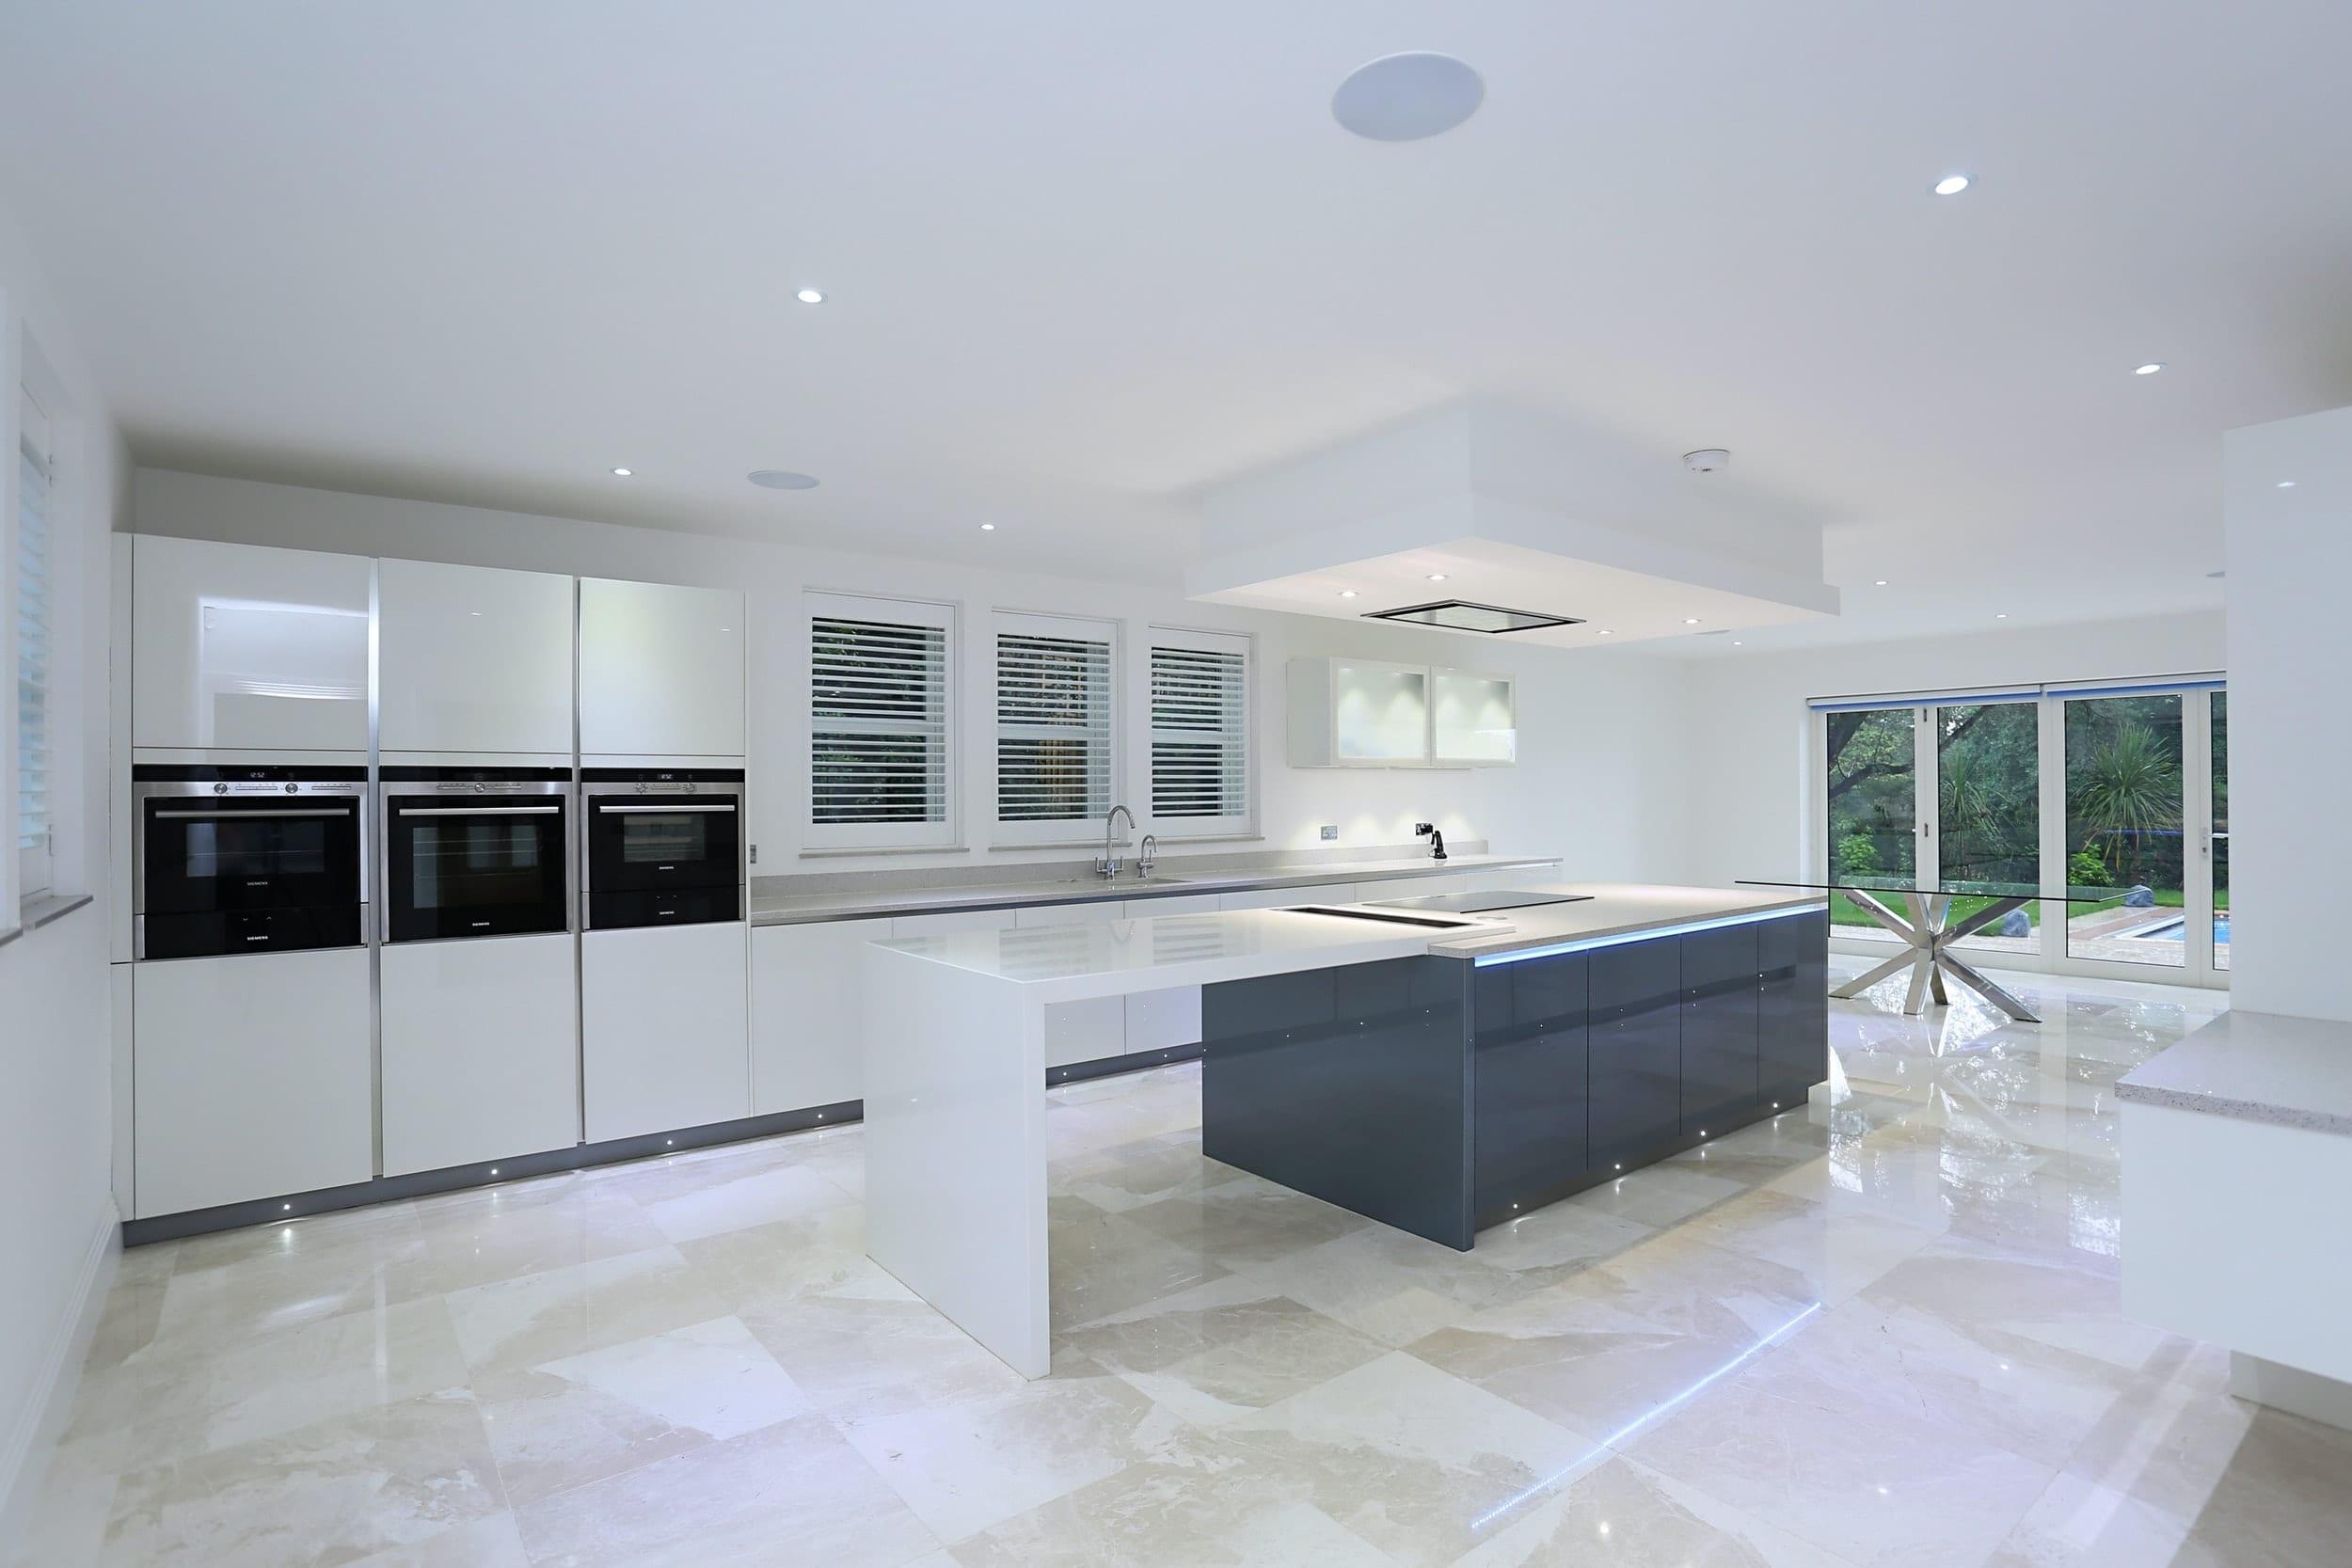 1. Handleless glass kitchen design 1 - Kavanagh Designs, Worthing